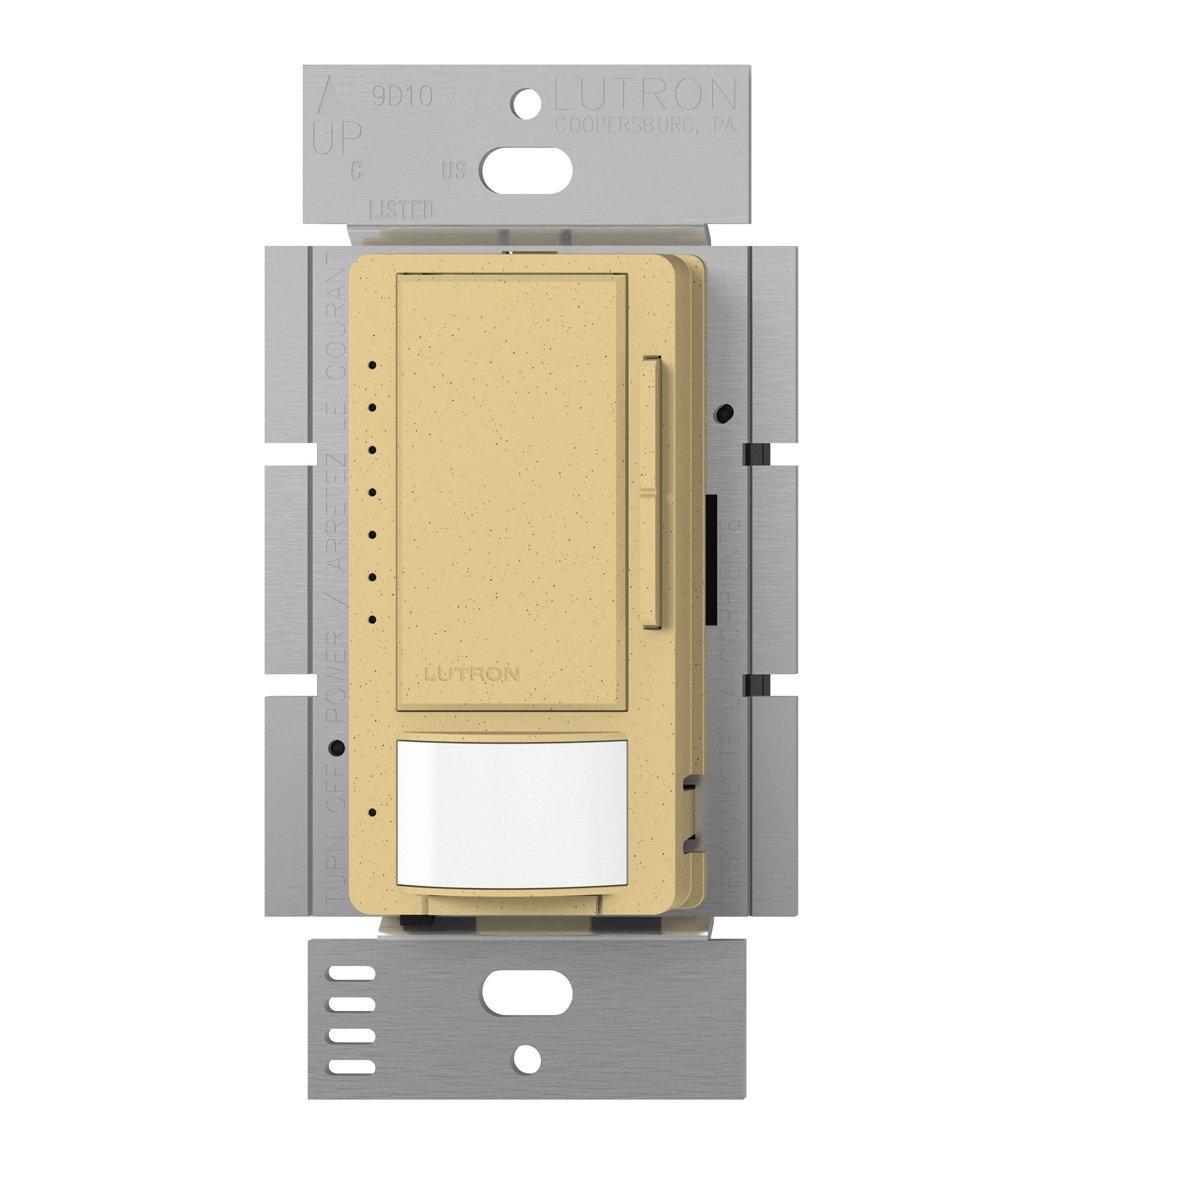 Lutron Maestro CL単極/ multi-location Vacancy Sensingディマー MSCL-VP153M-GS 1 B00FQL25UQ Goldstone Goldstone